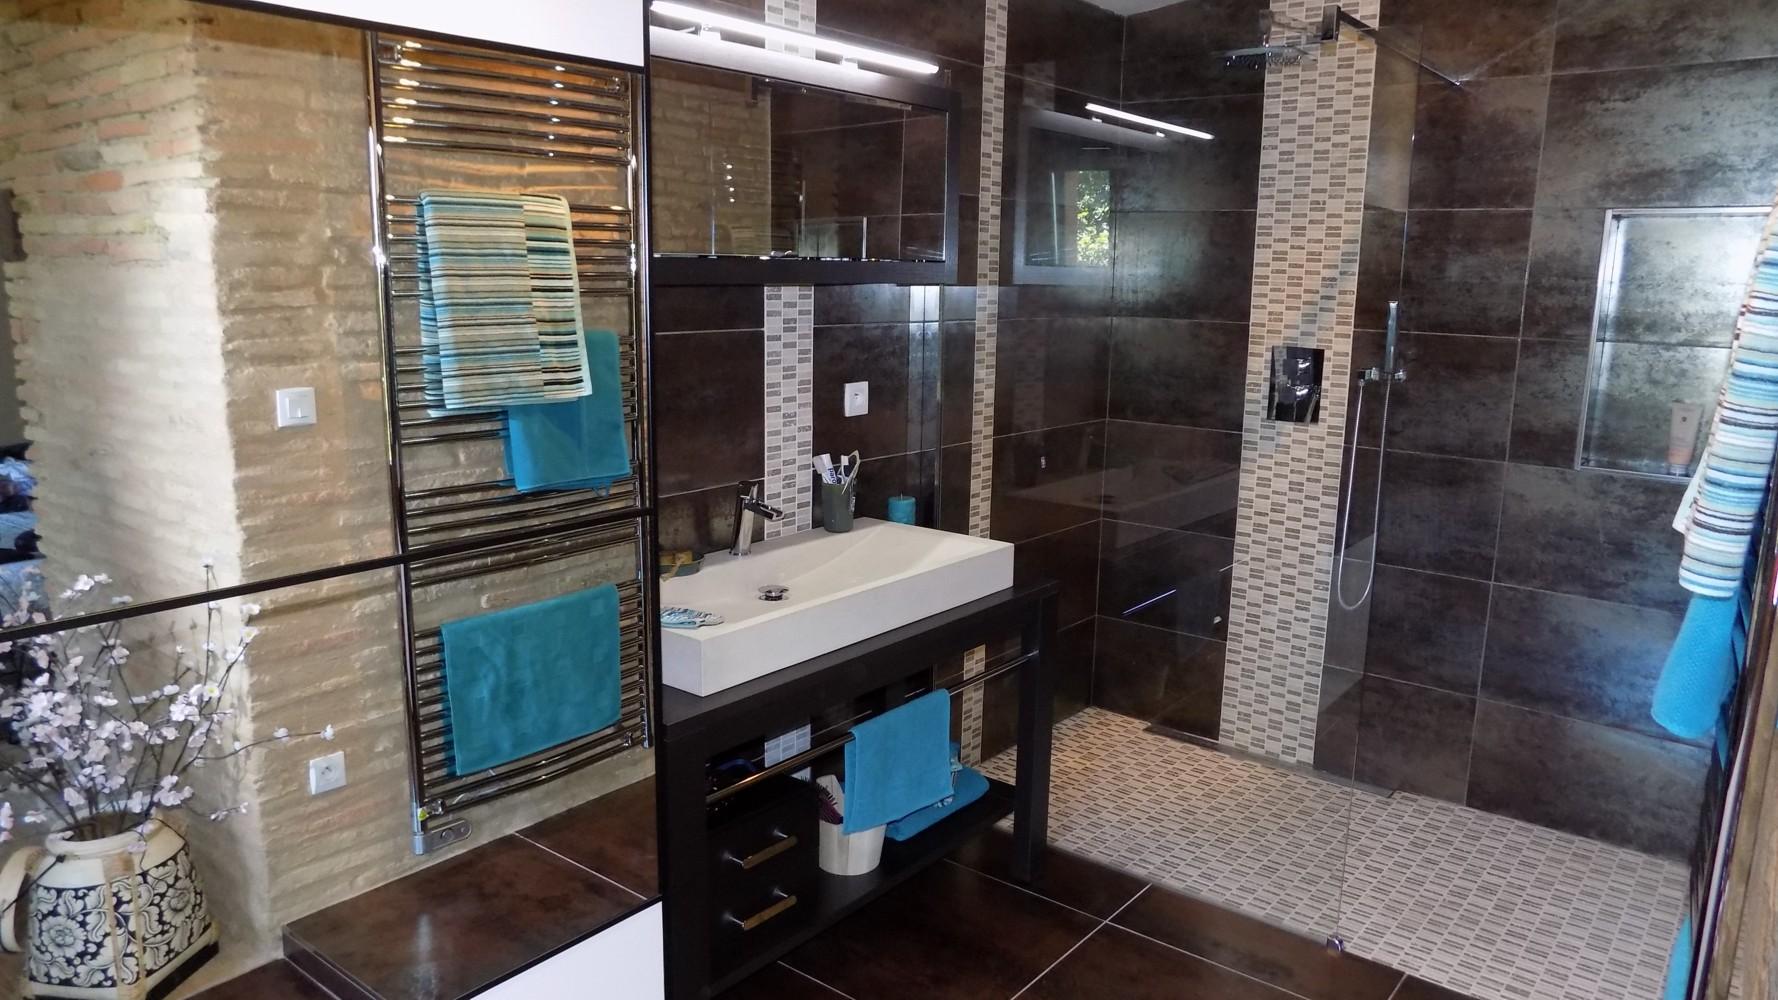 Renovation Salle de bain Douche italienne - Artisan Maçon ...